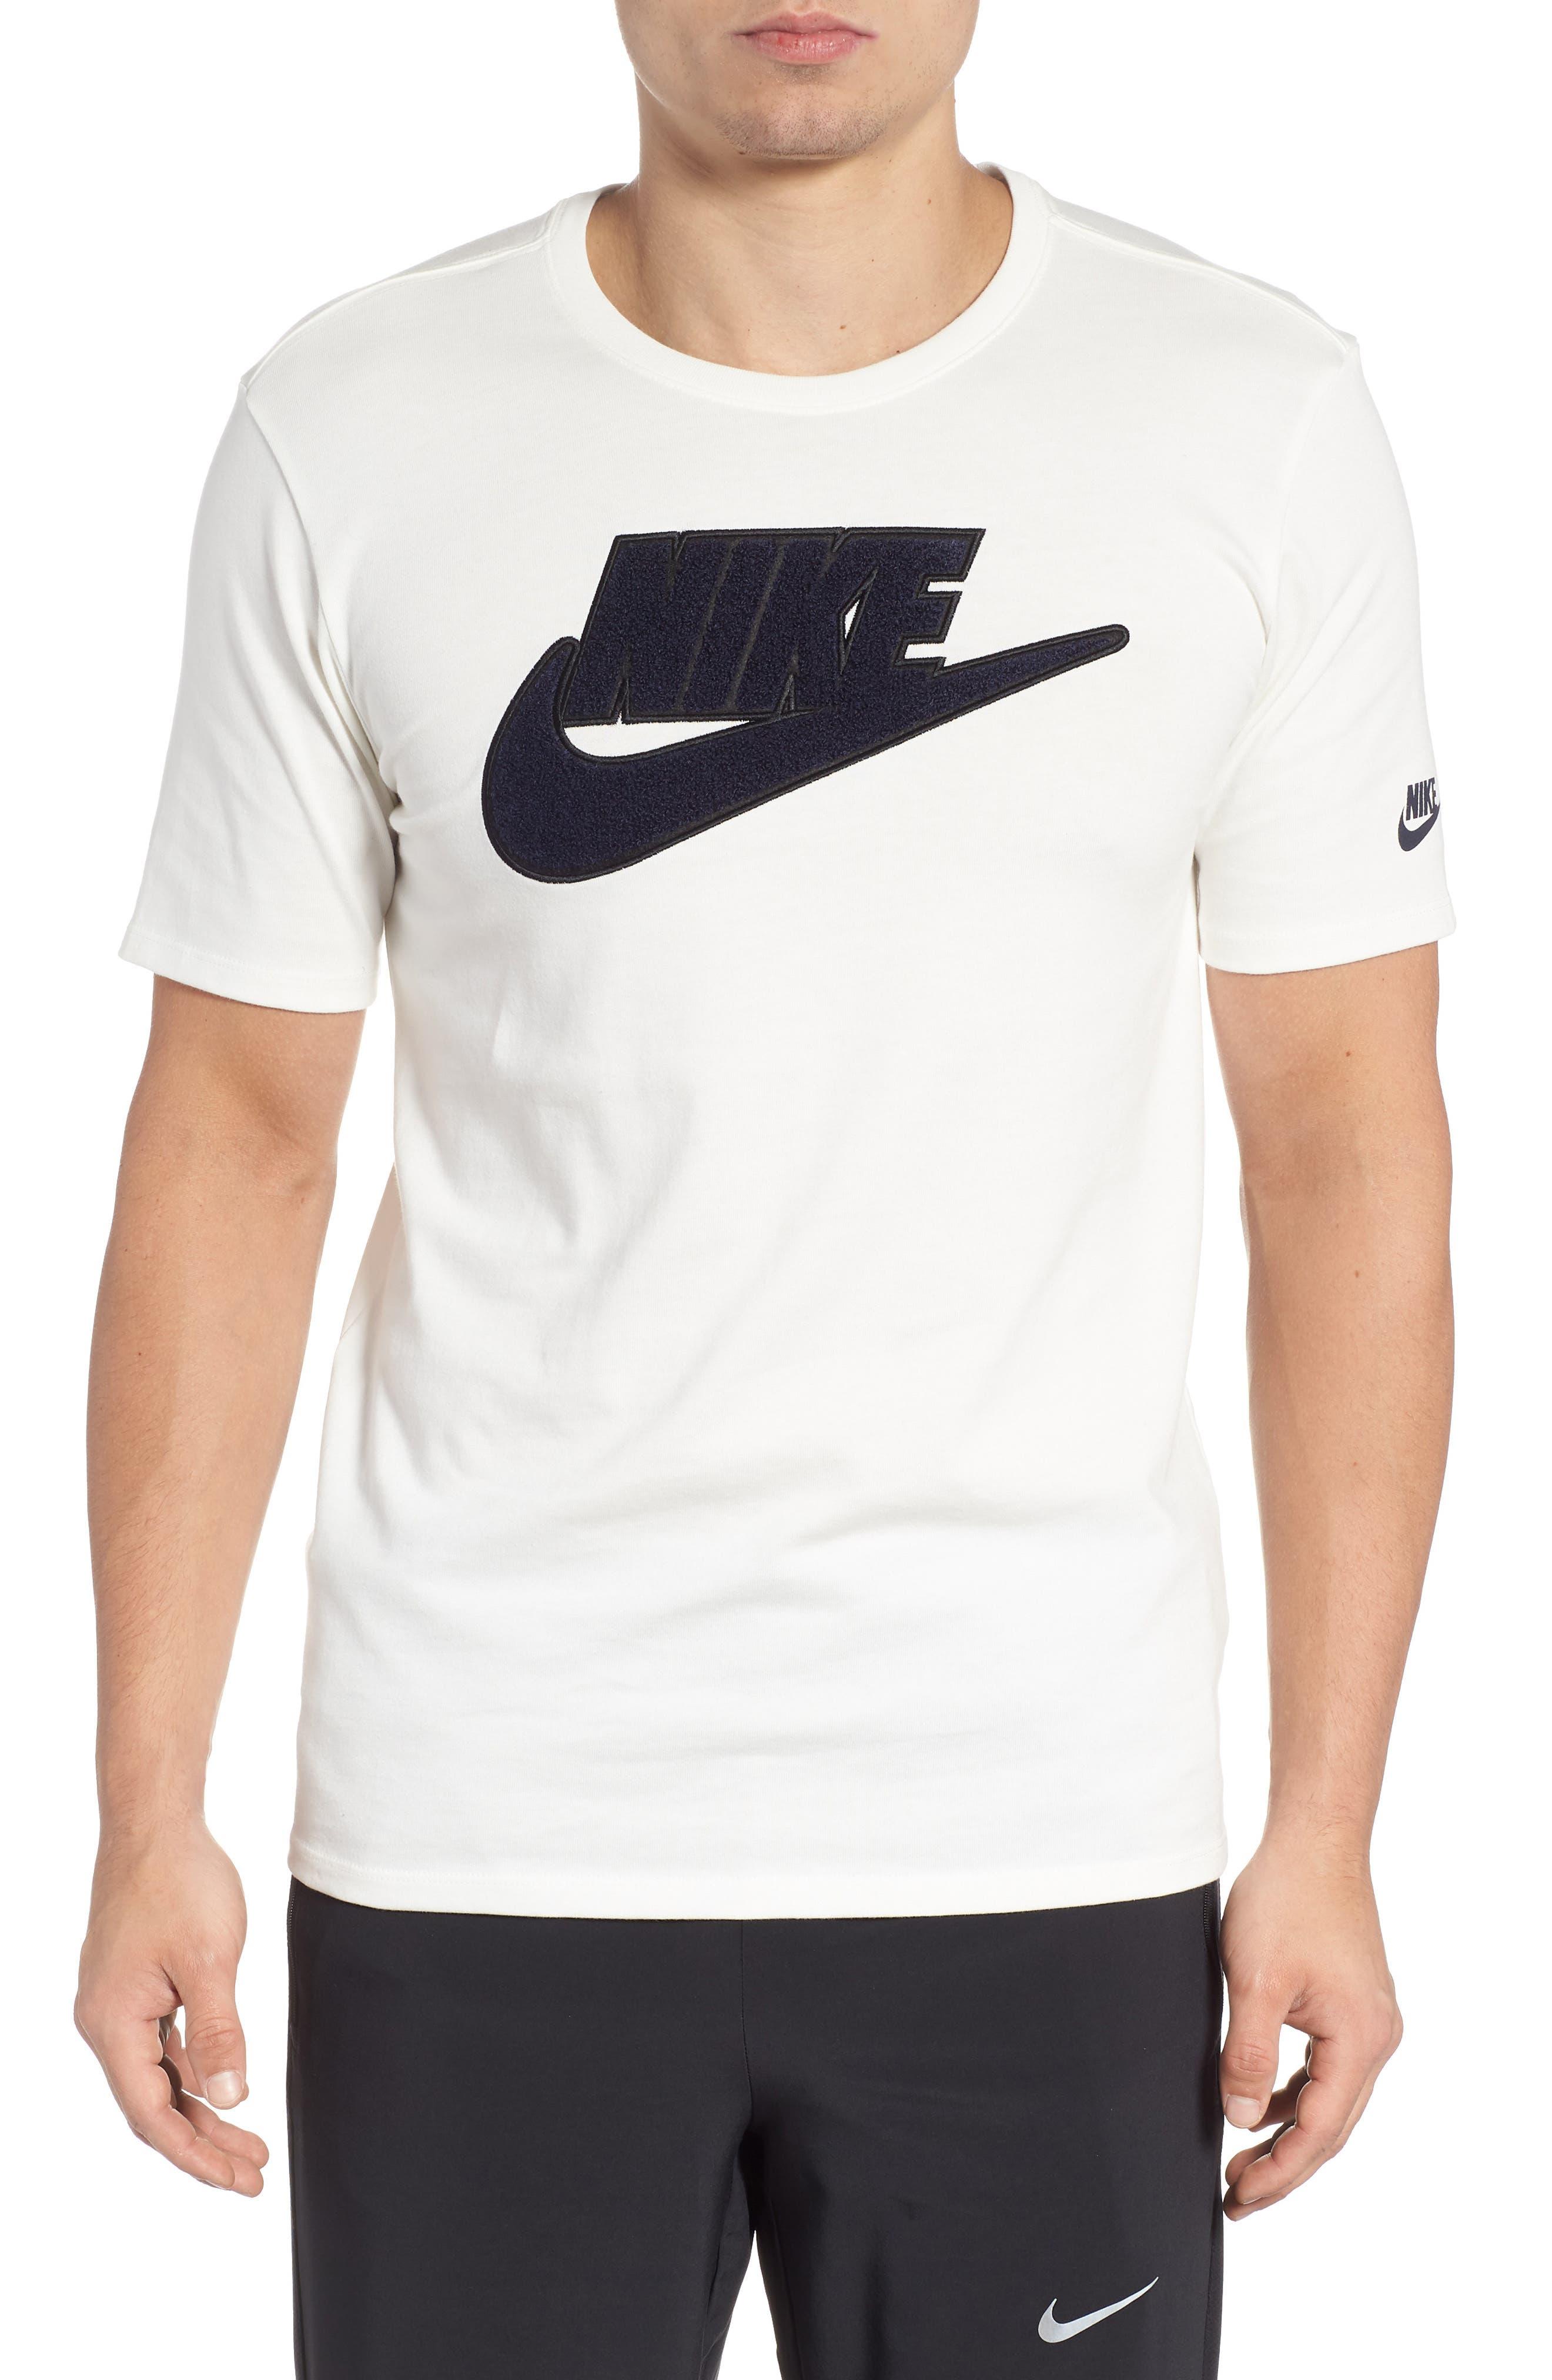 Nike Innovation Logo T-Shirt, White